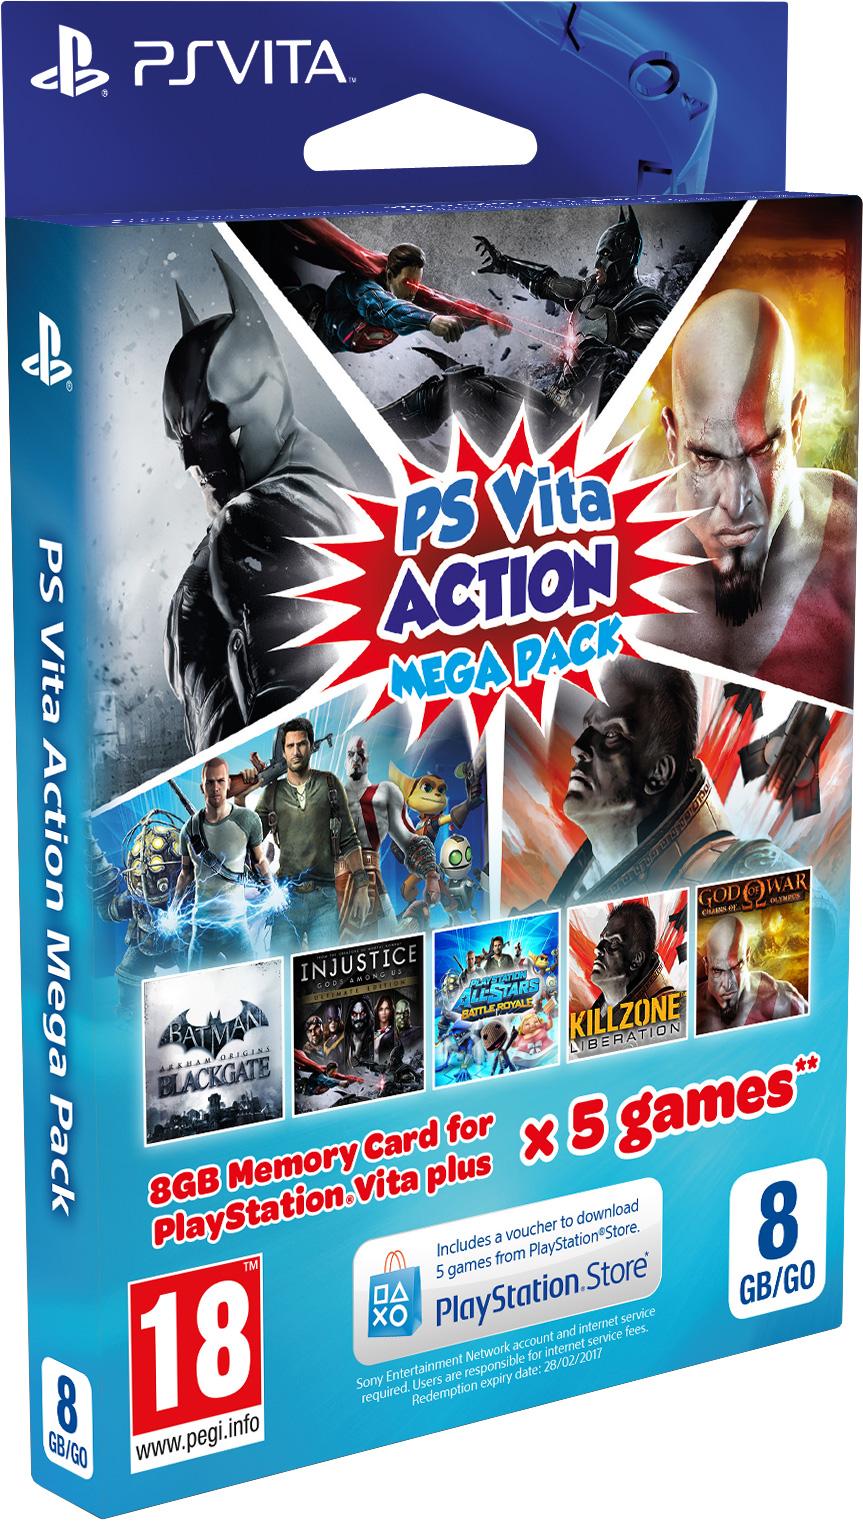 Kinderspiele Mega-Pack 2019 pc game Img-2